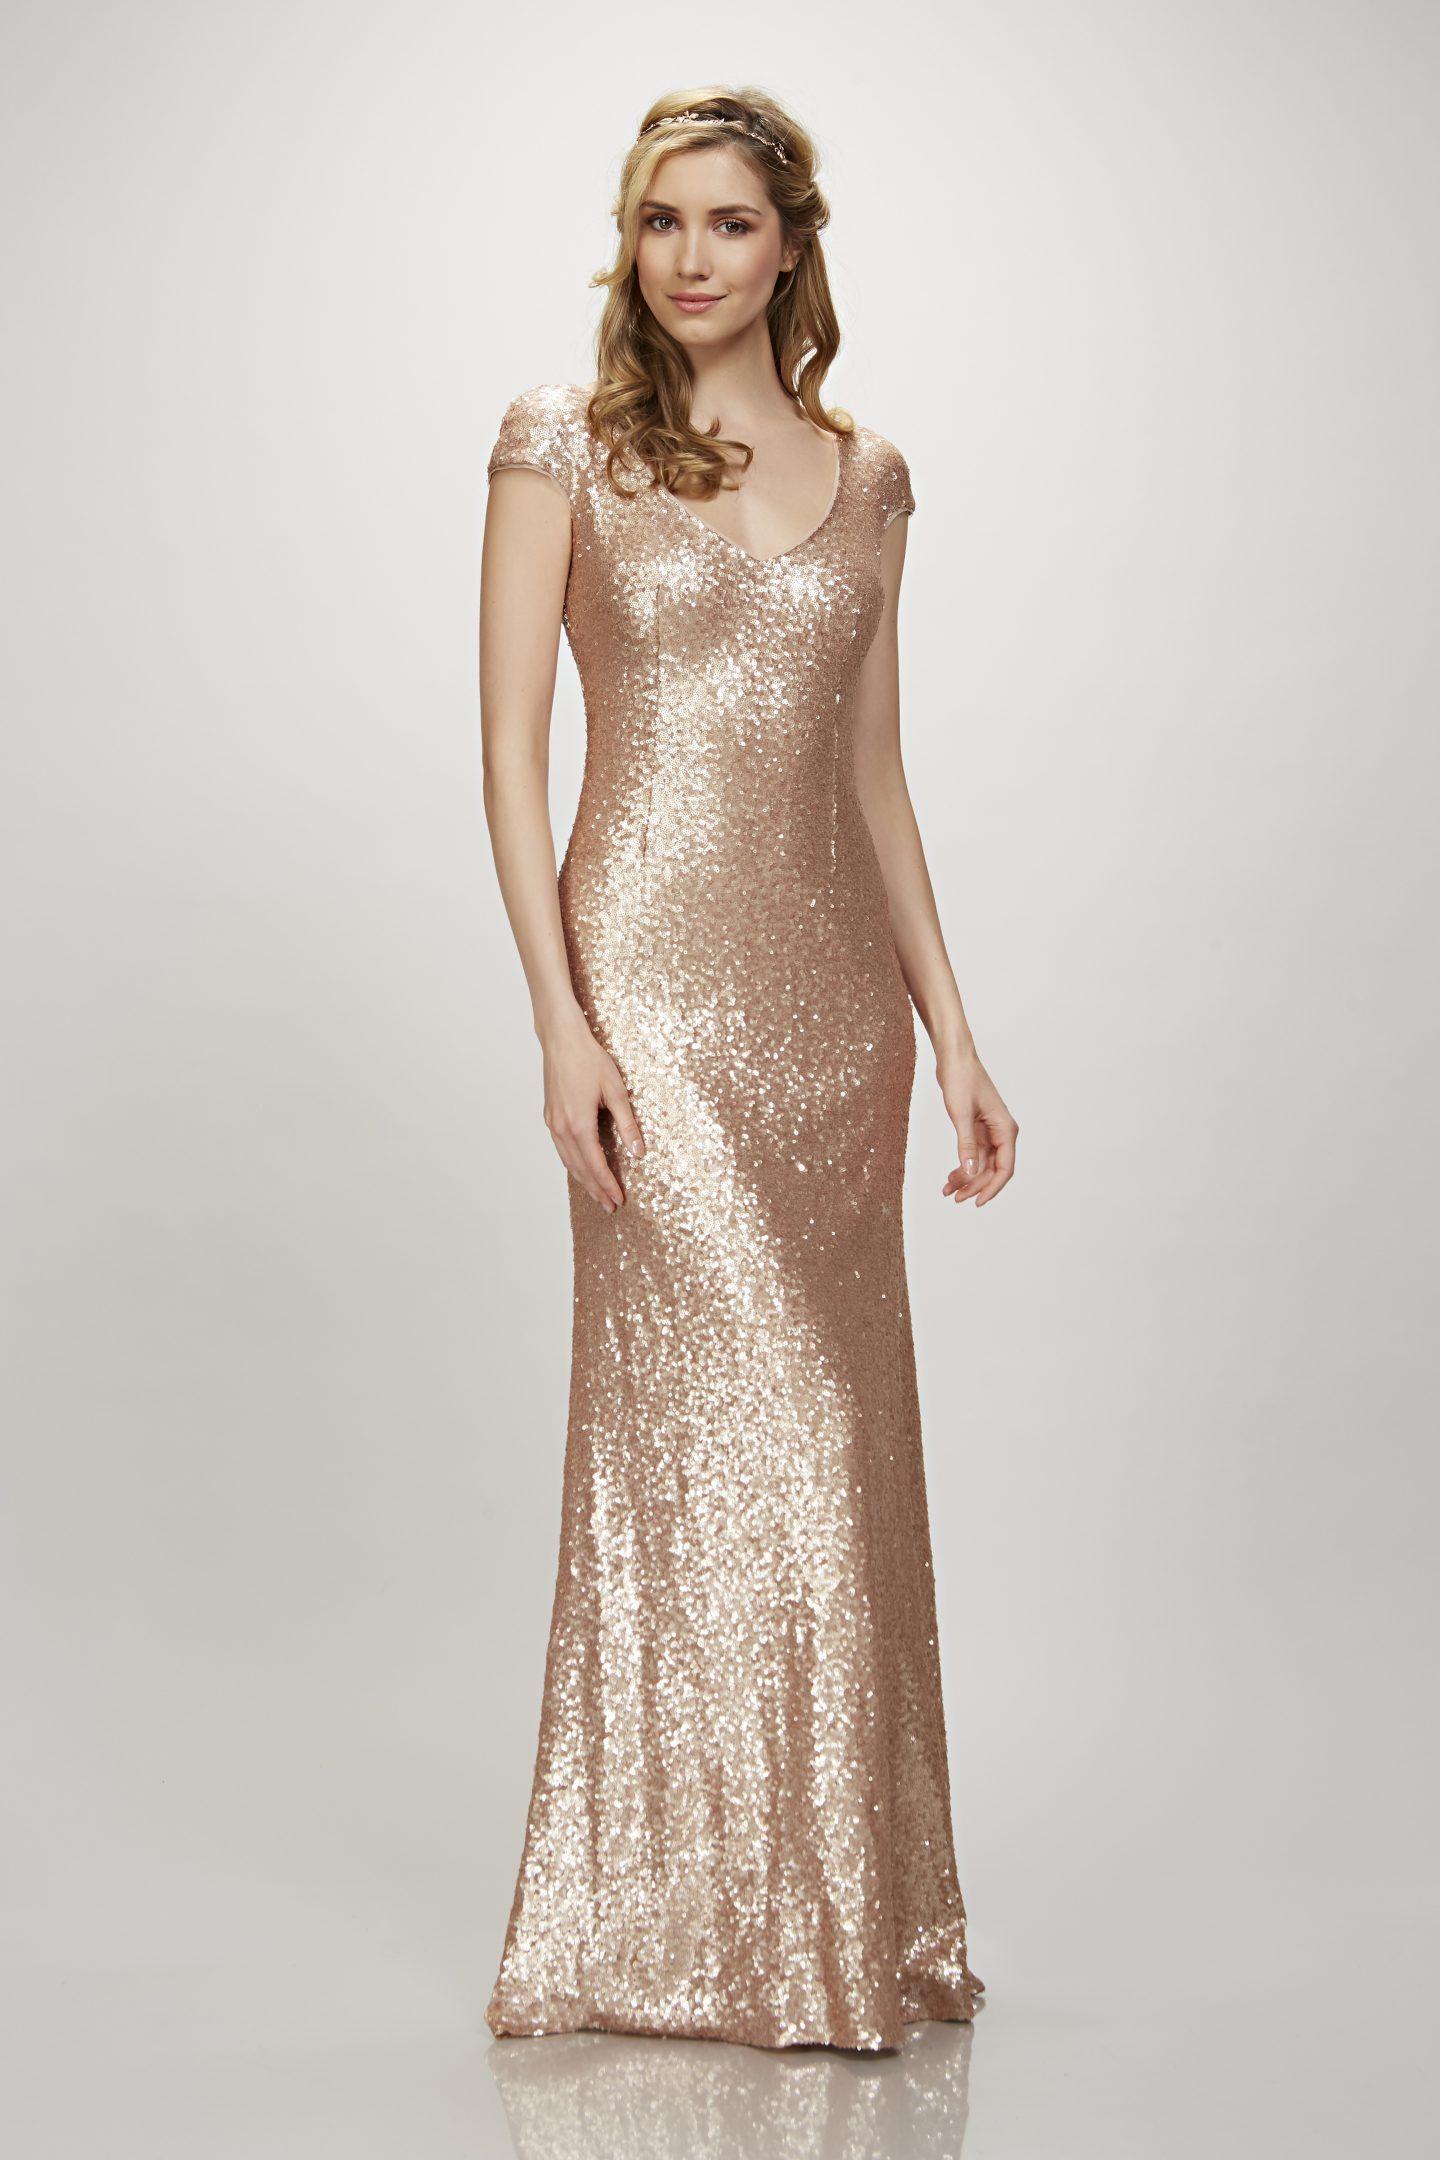 THEIA Bridal Kaylee gold sequin bridesmaid dress long bridesmaids ...